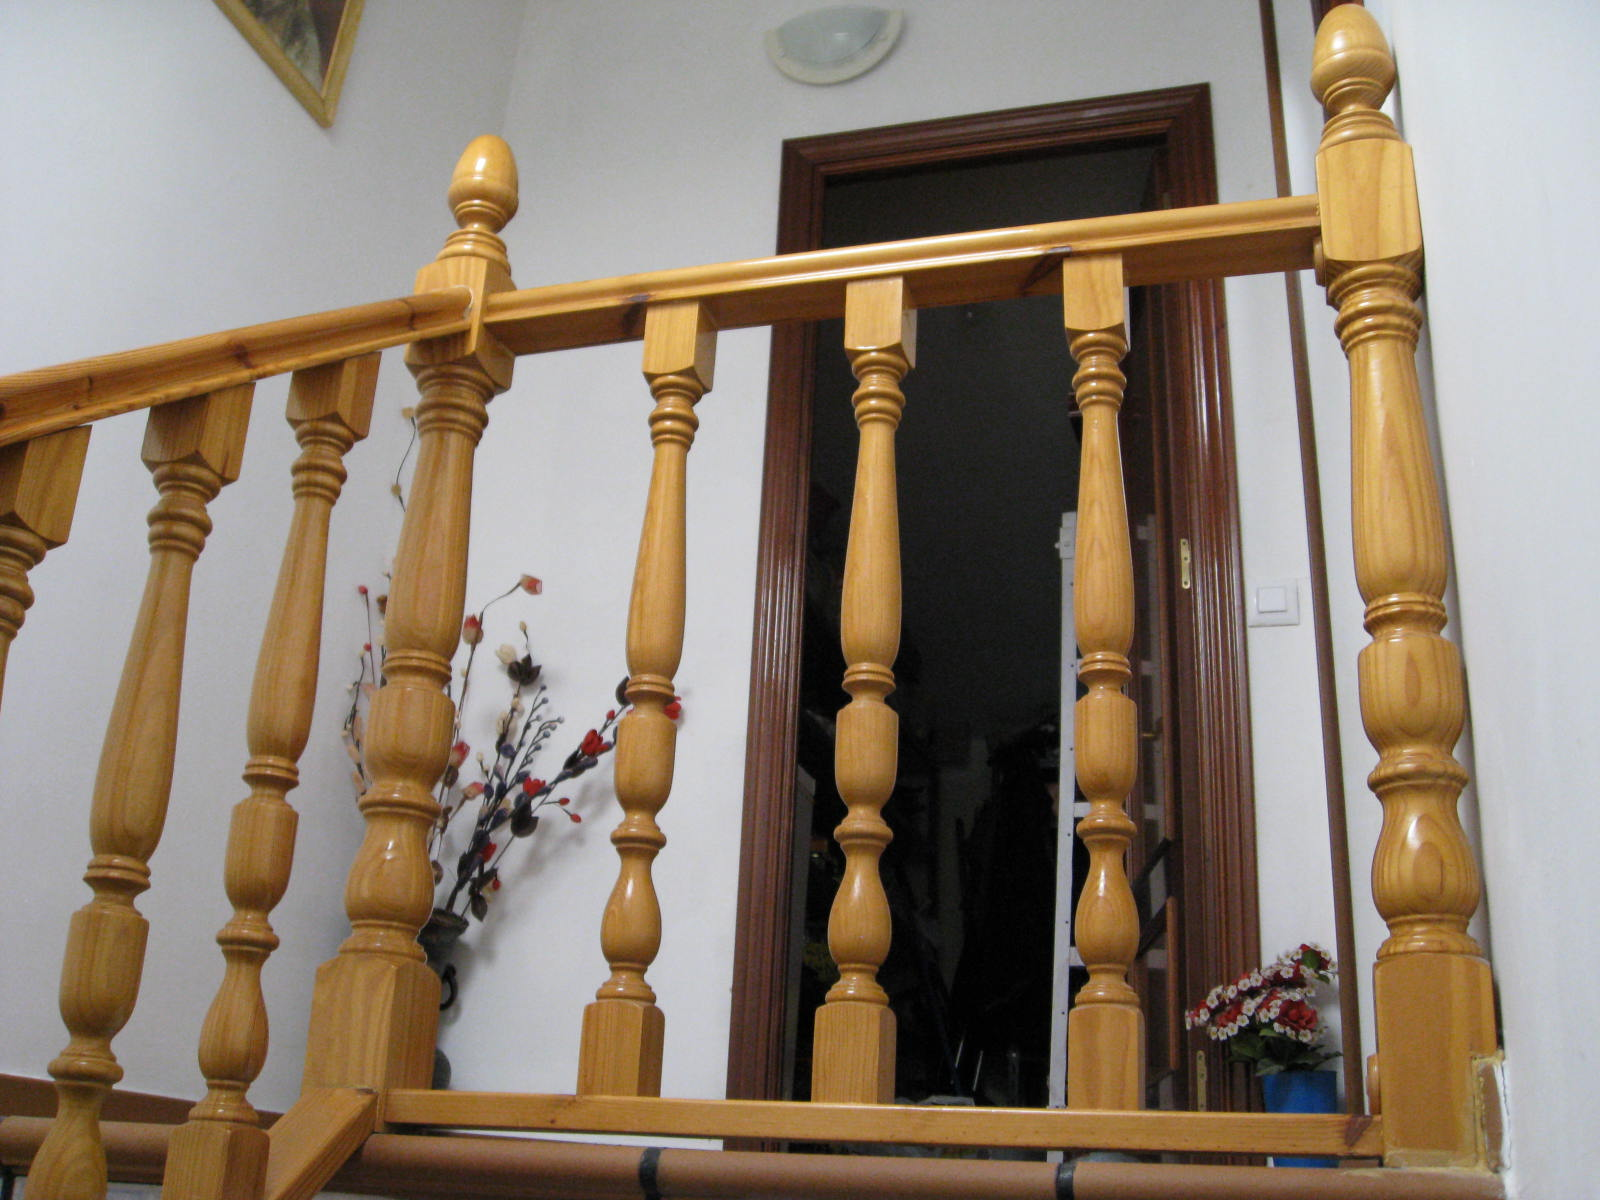 barandillas de madera balaustres y balaustradas de